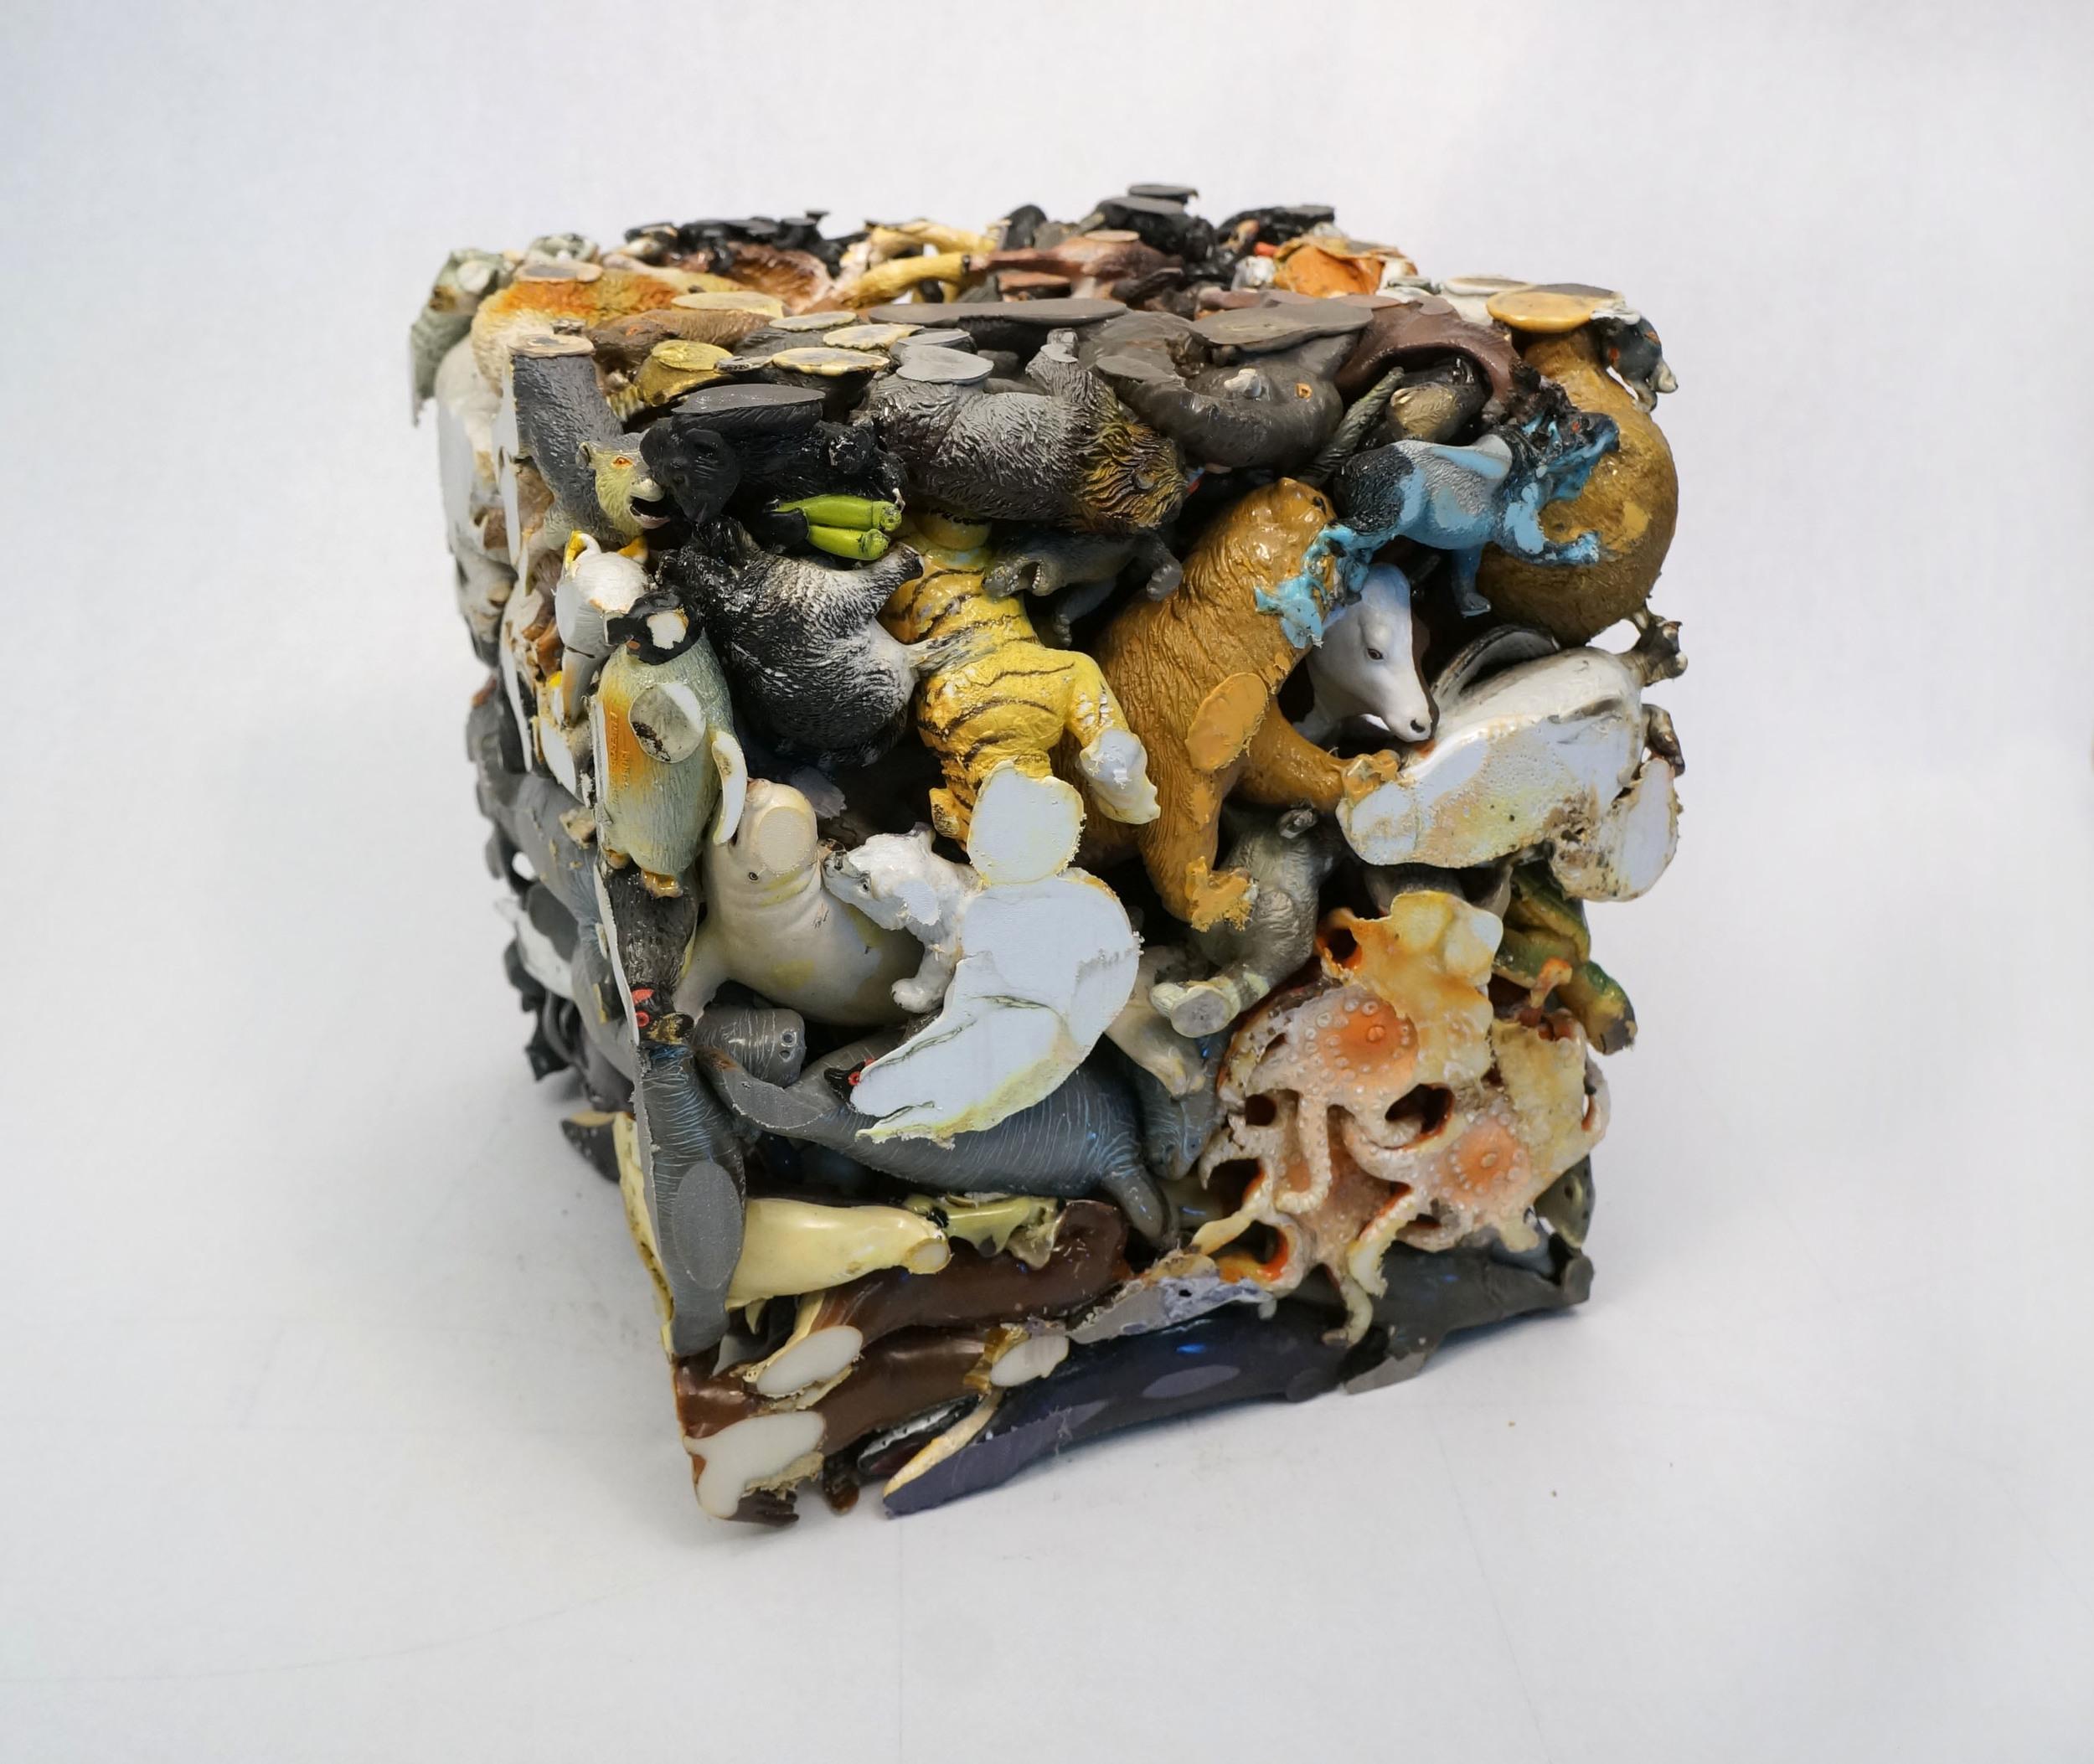 """Animal Cube""   Lucia Thomé   2014  Plastic Animals  12""x 12"" x 12"""